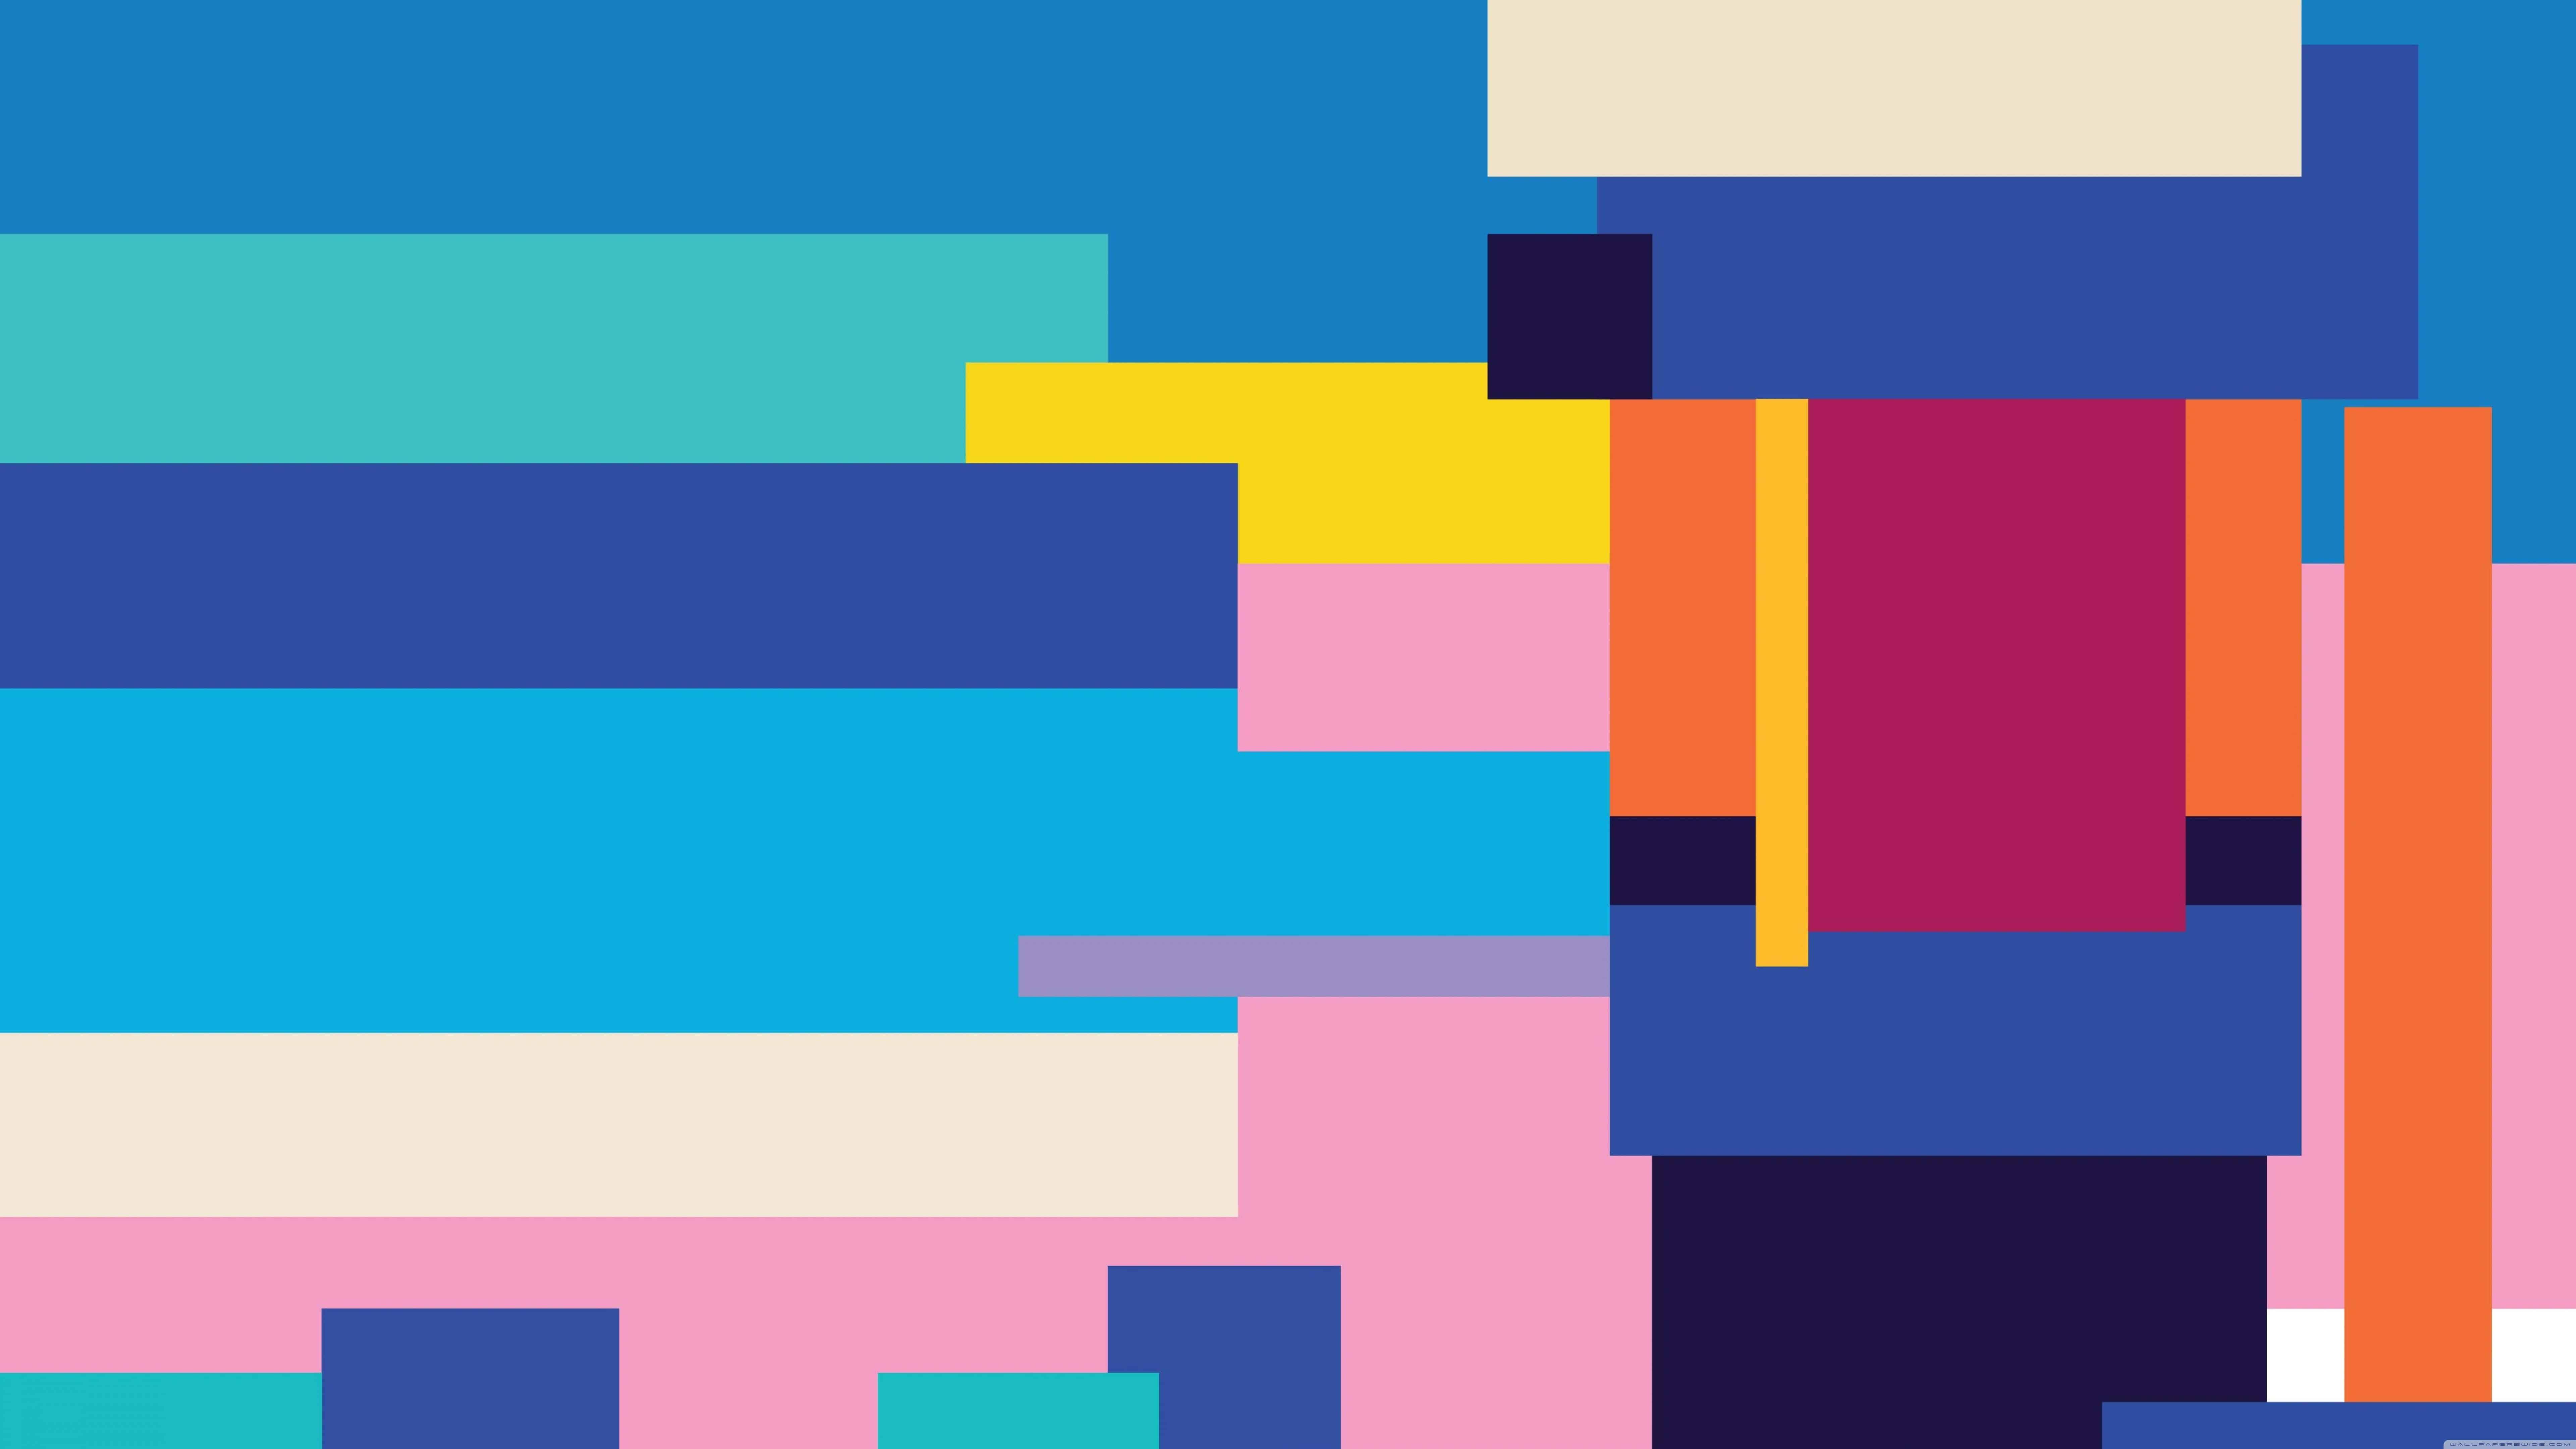 Geometric Wallpaper Hd Abstract Geometric Uhd 8k Wallpaper Pixelz